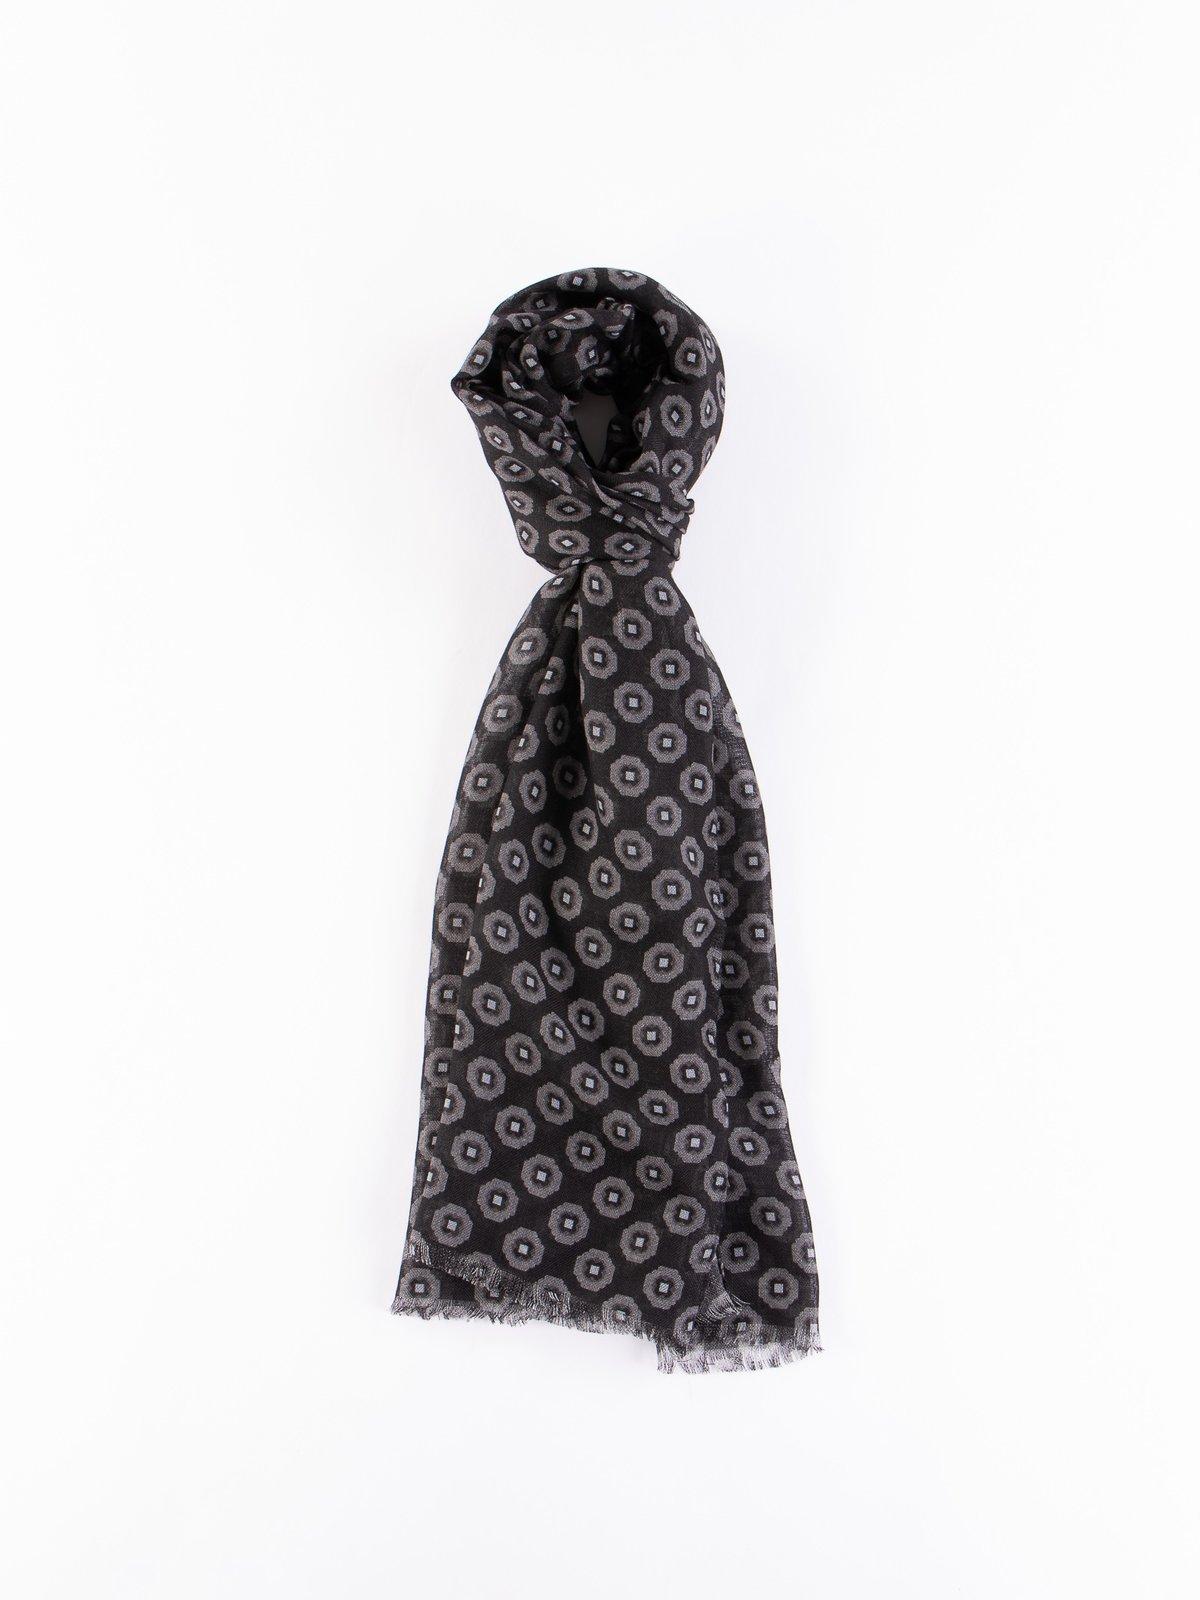 Black/Grey Wool Gauze Foulard Dress Scarf - Image 1